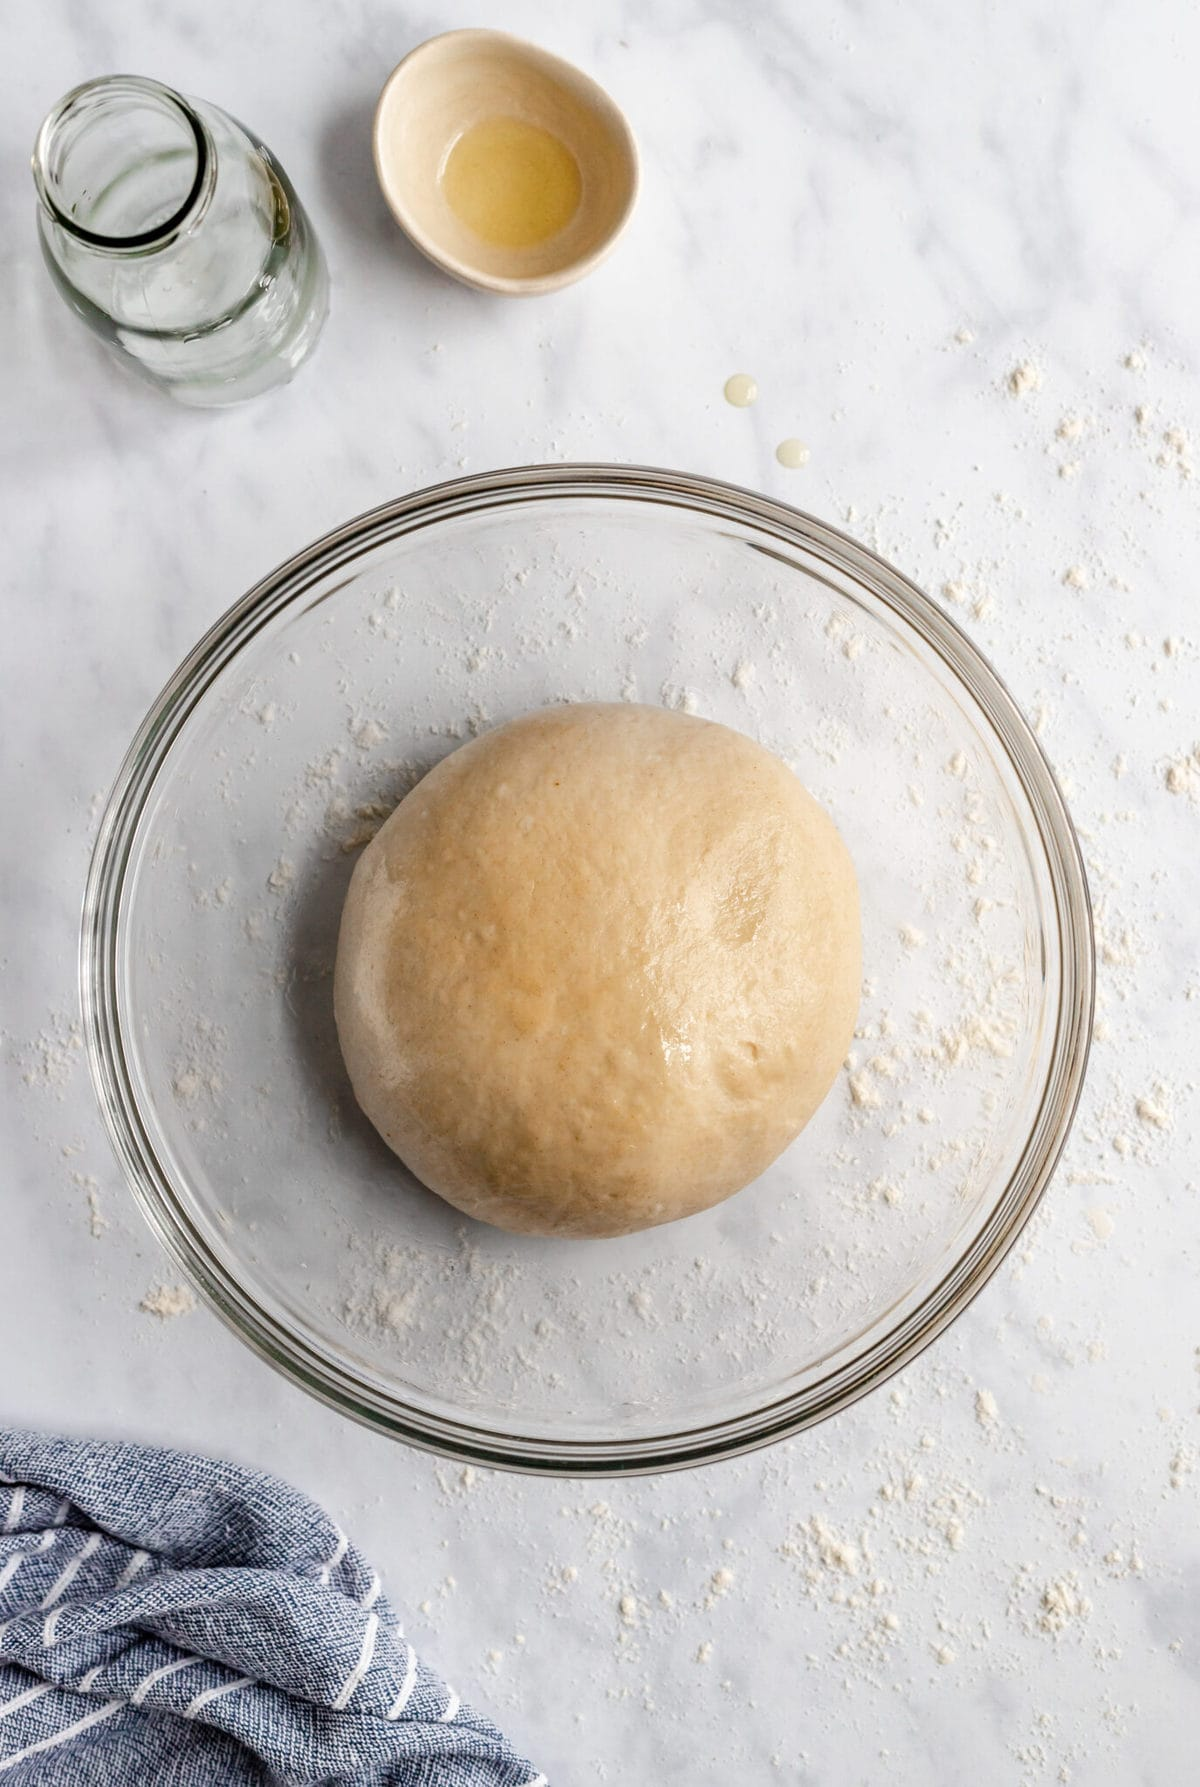 pizza dough in a bowl rising birds eye view